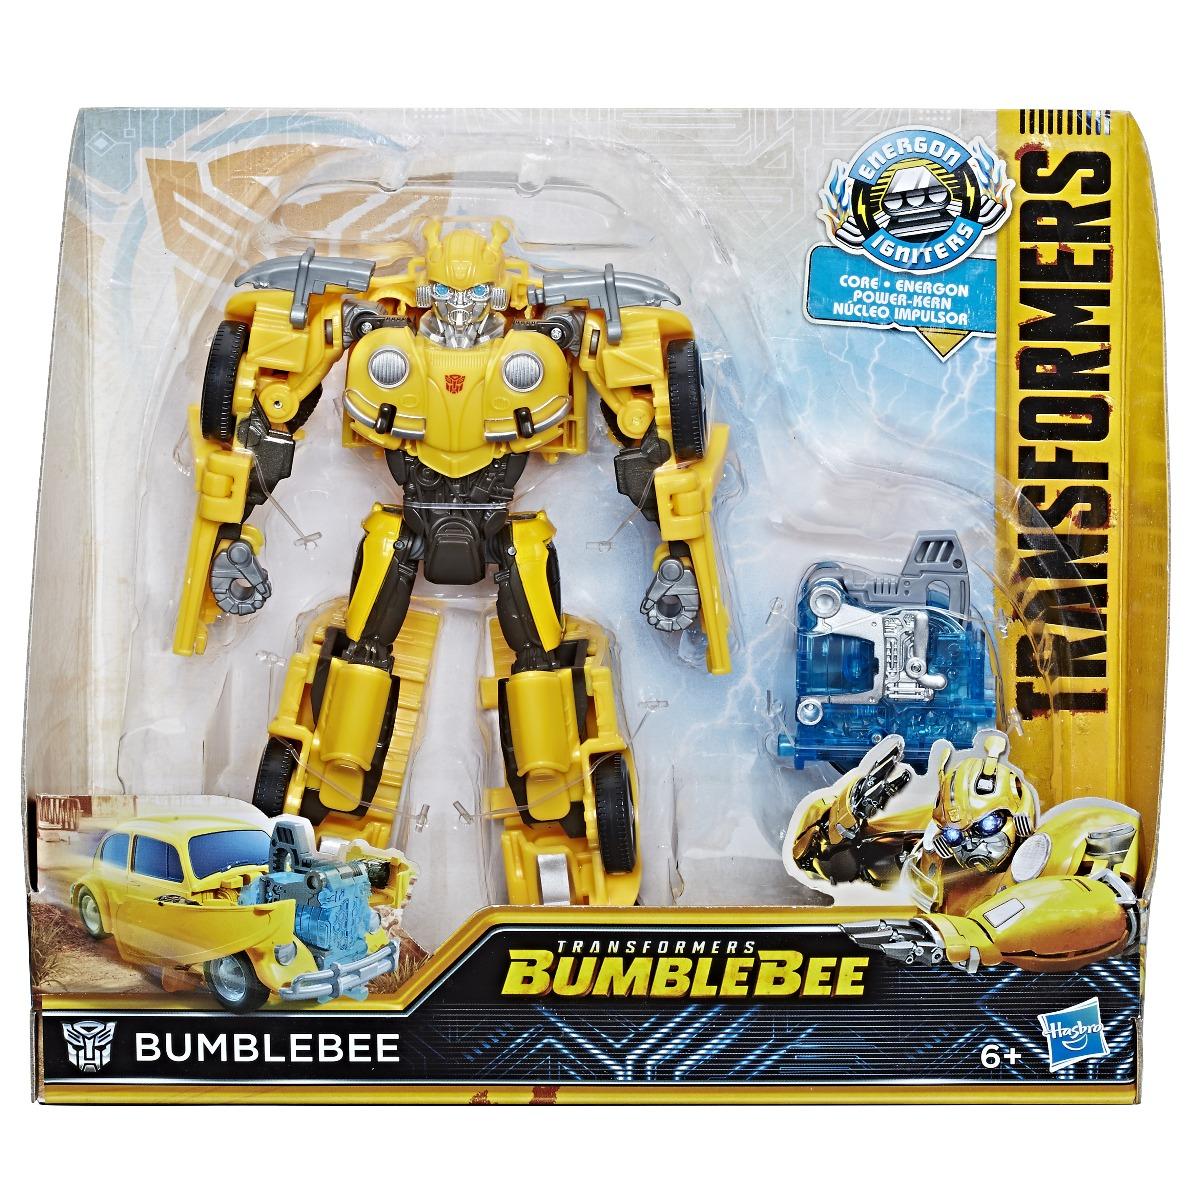 Figurina Transformers Energon Igniters Nitro Bumblebee Beetle